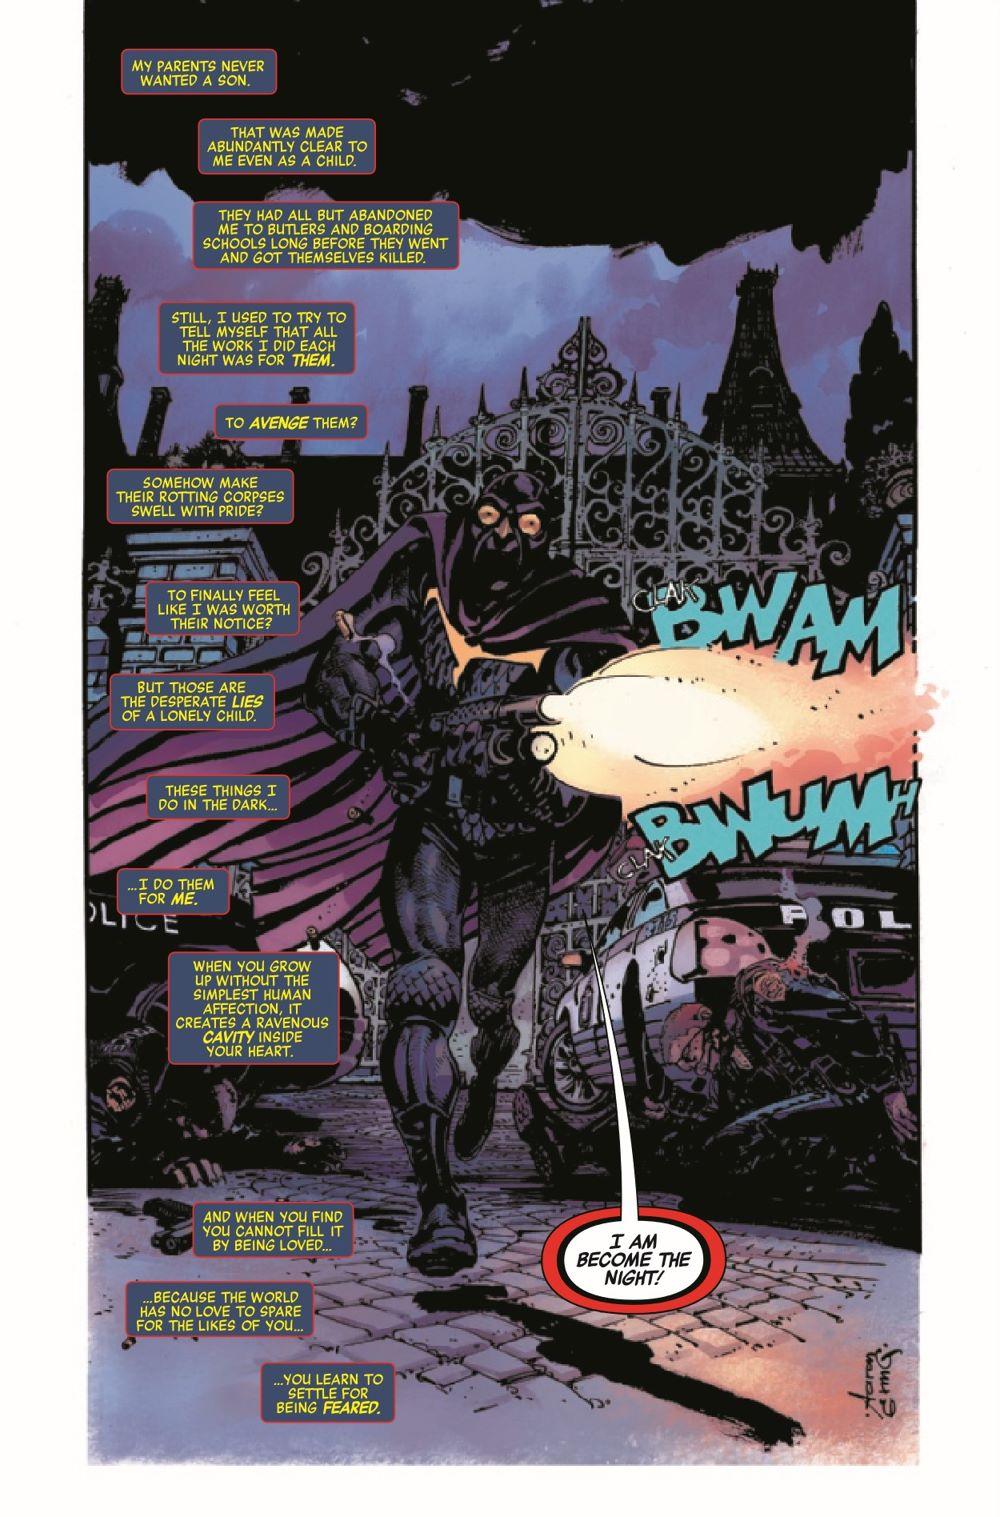 HEROESREBORN2021005_Preview-3 ComicList Previews: HEROES REBORN #5 (OF 7)